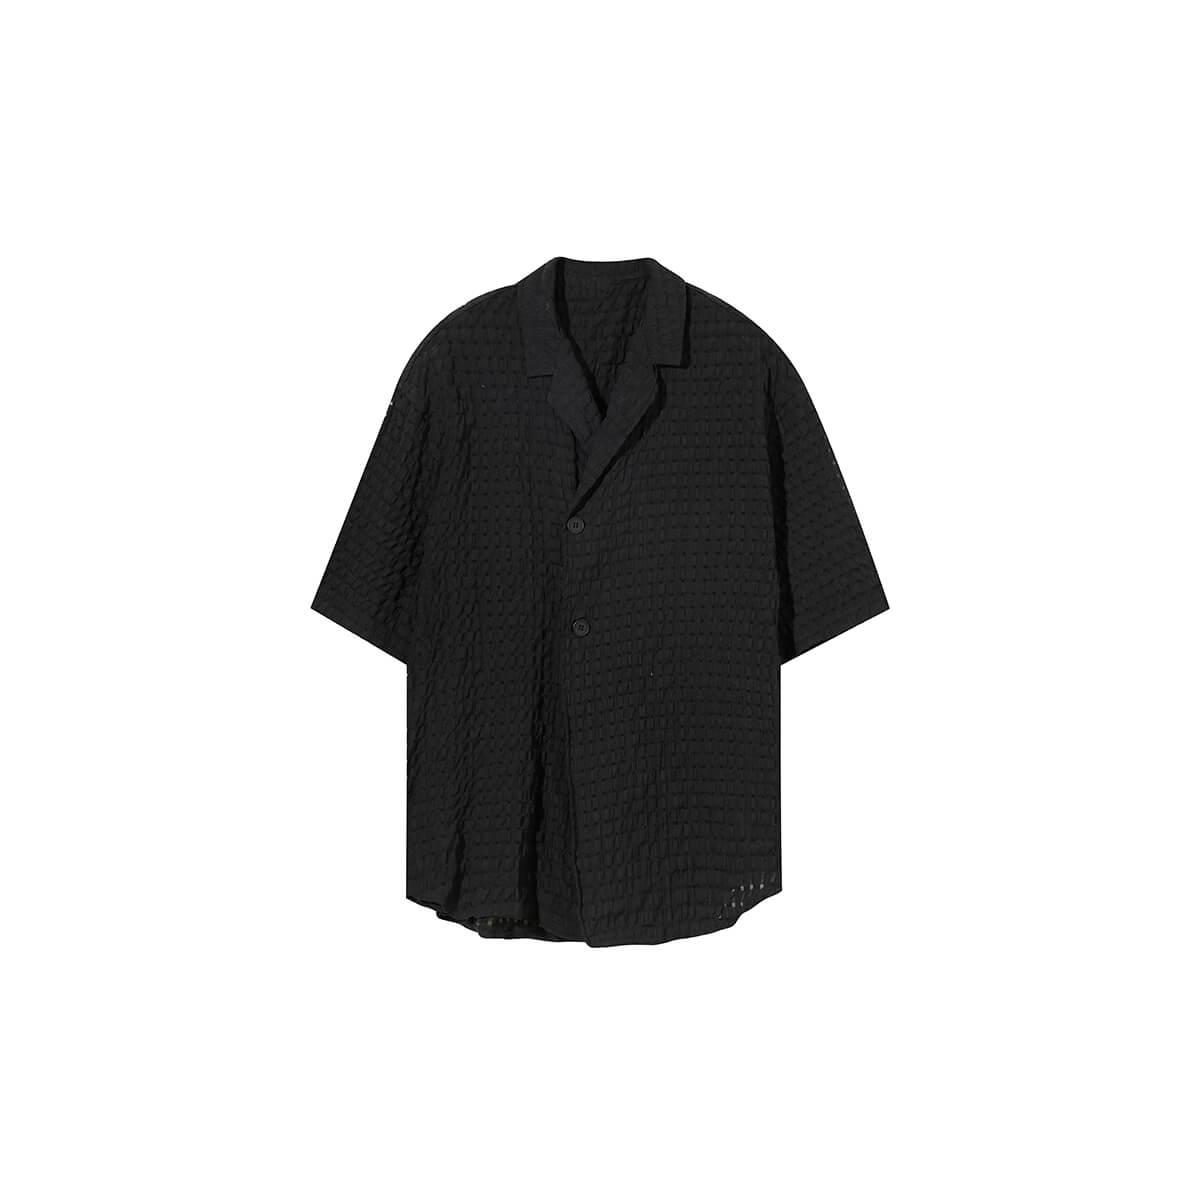 Рубашка Cui Layout Studio Lightweight Shirt Lattice Texture Black